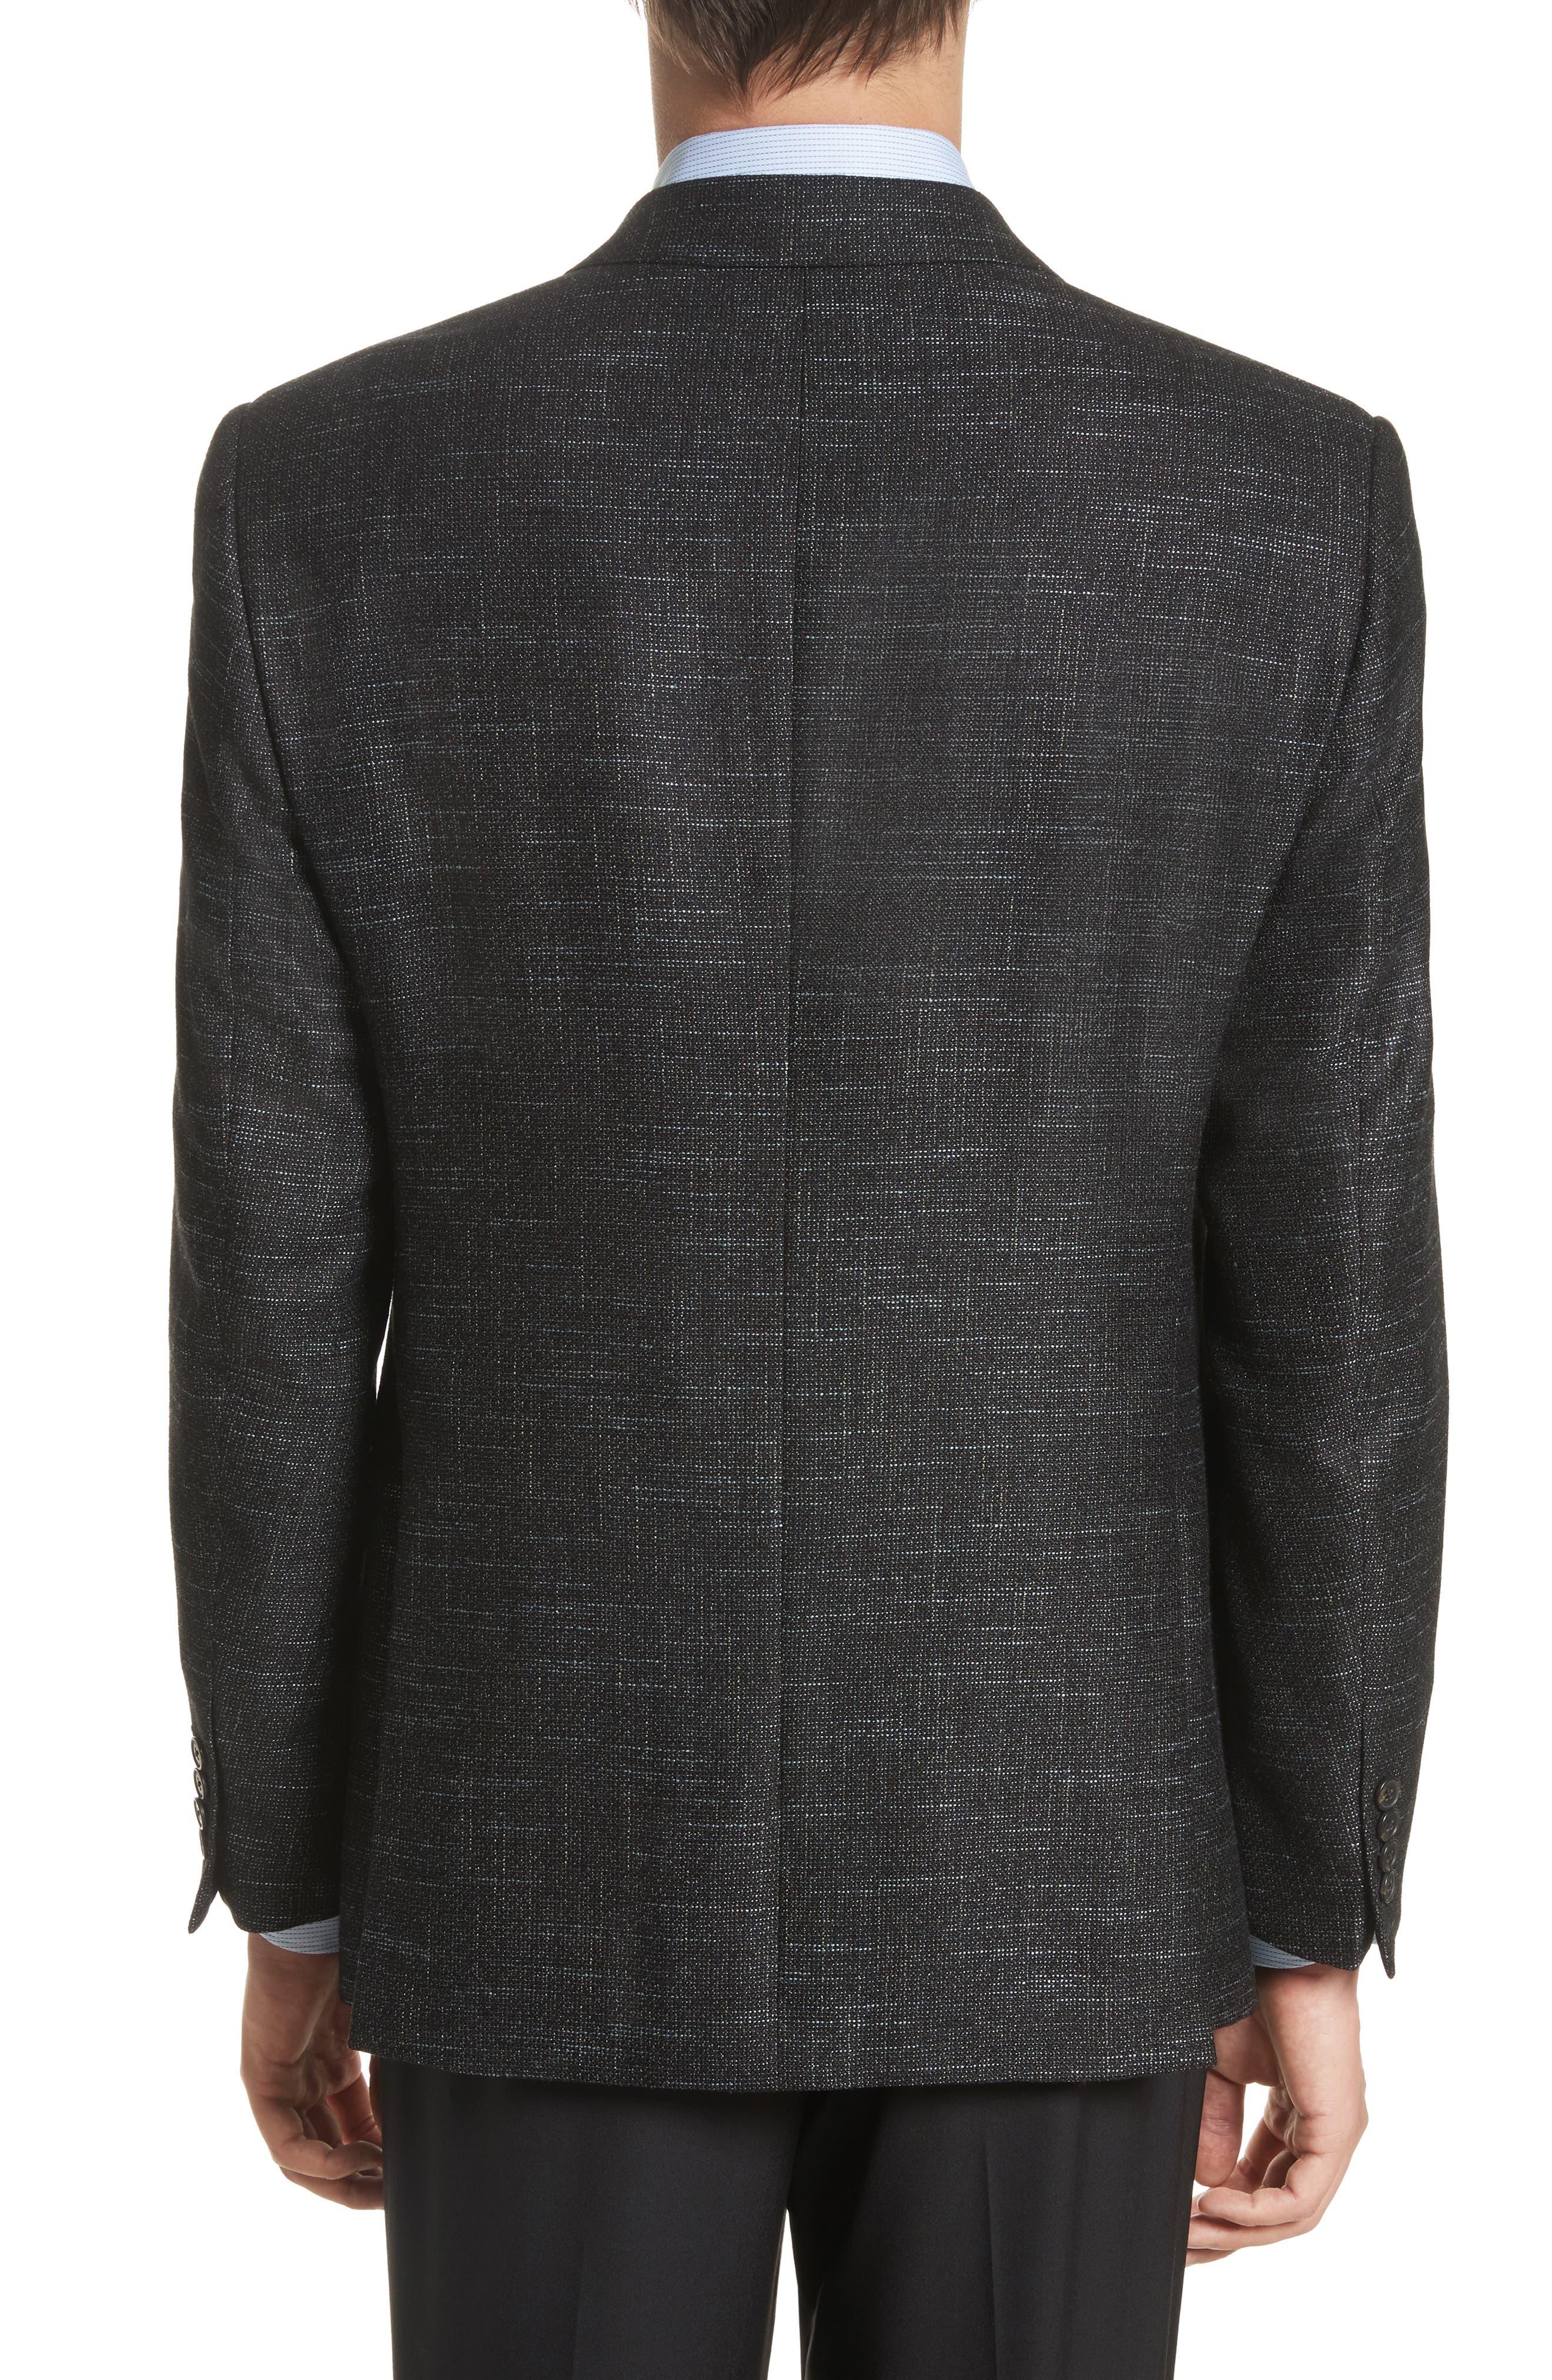 G-Line Trim Fit Wool Blend Blazer,                             Alternate thumbnail 2, color,                             355